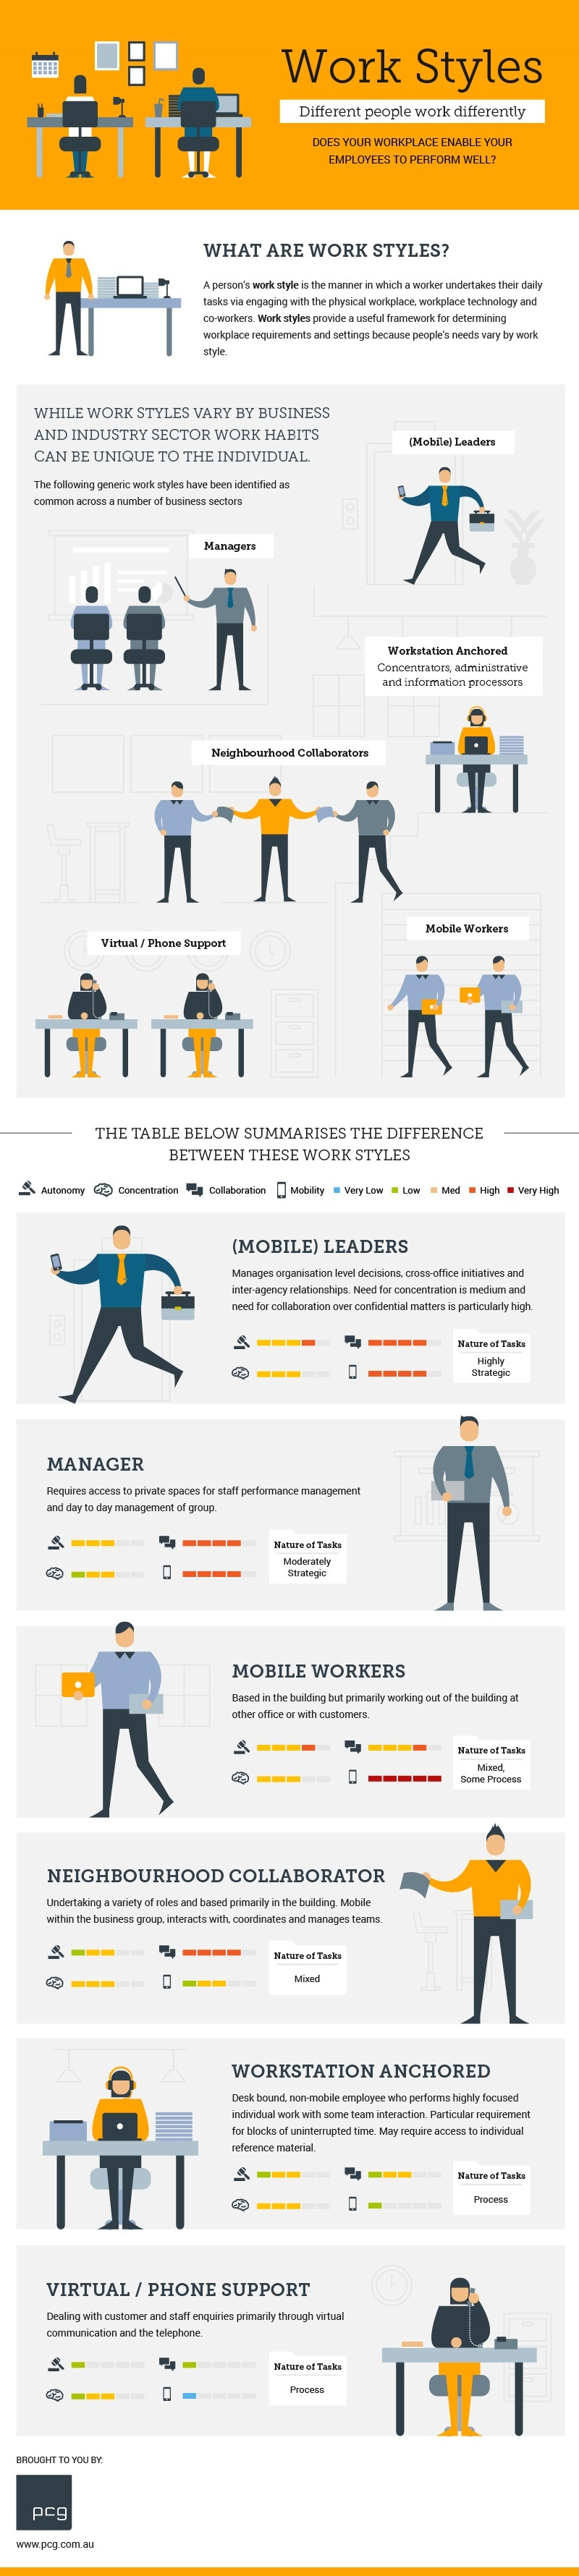 work-style-infographic.jpg